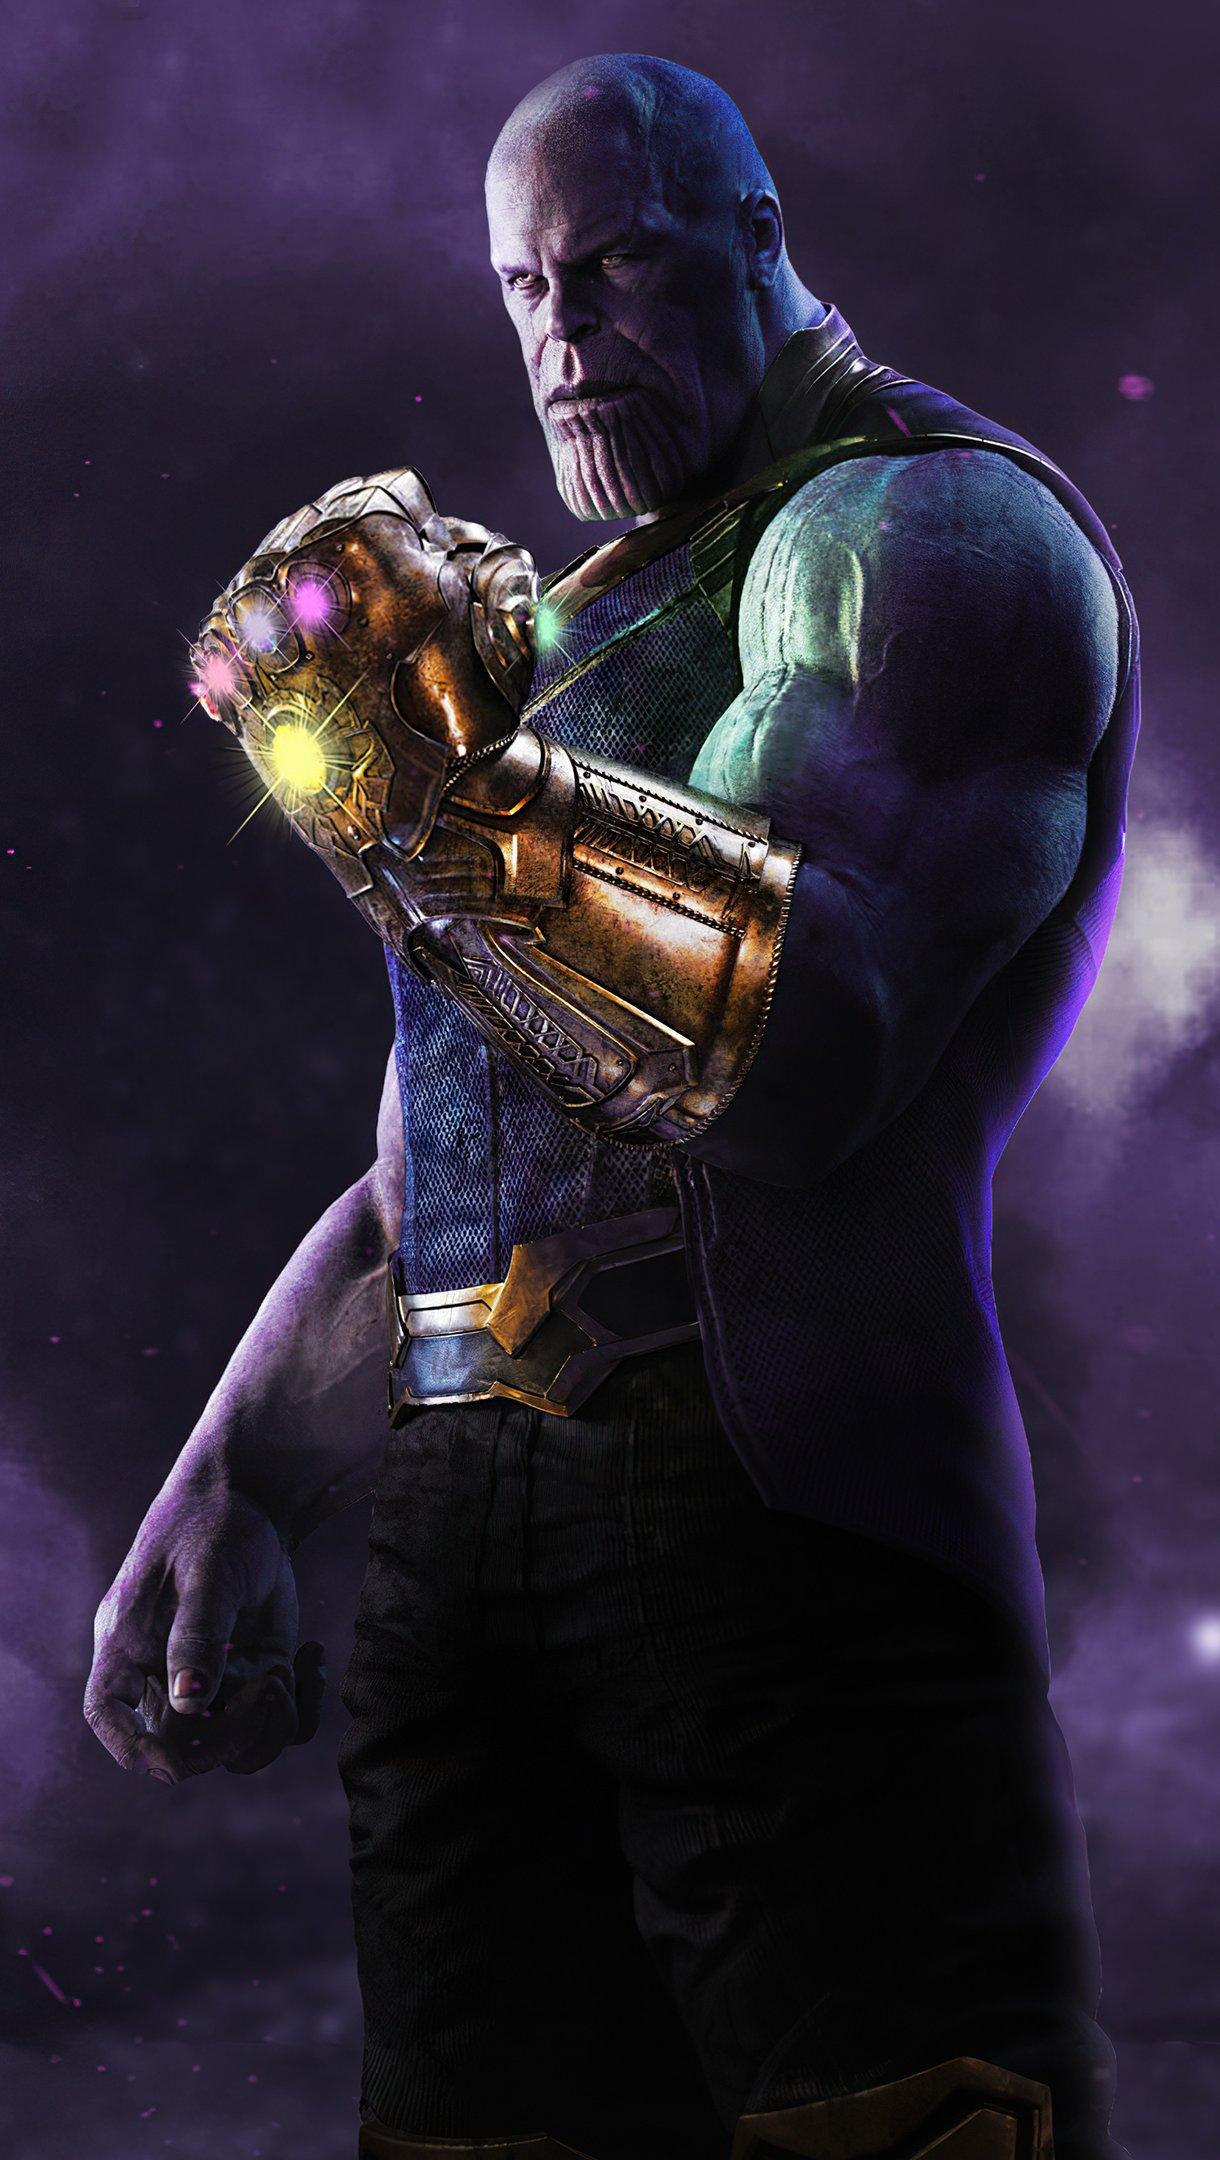 Wallpaper Thanos The Mad Titan Vertical